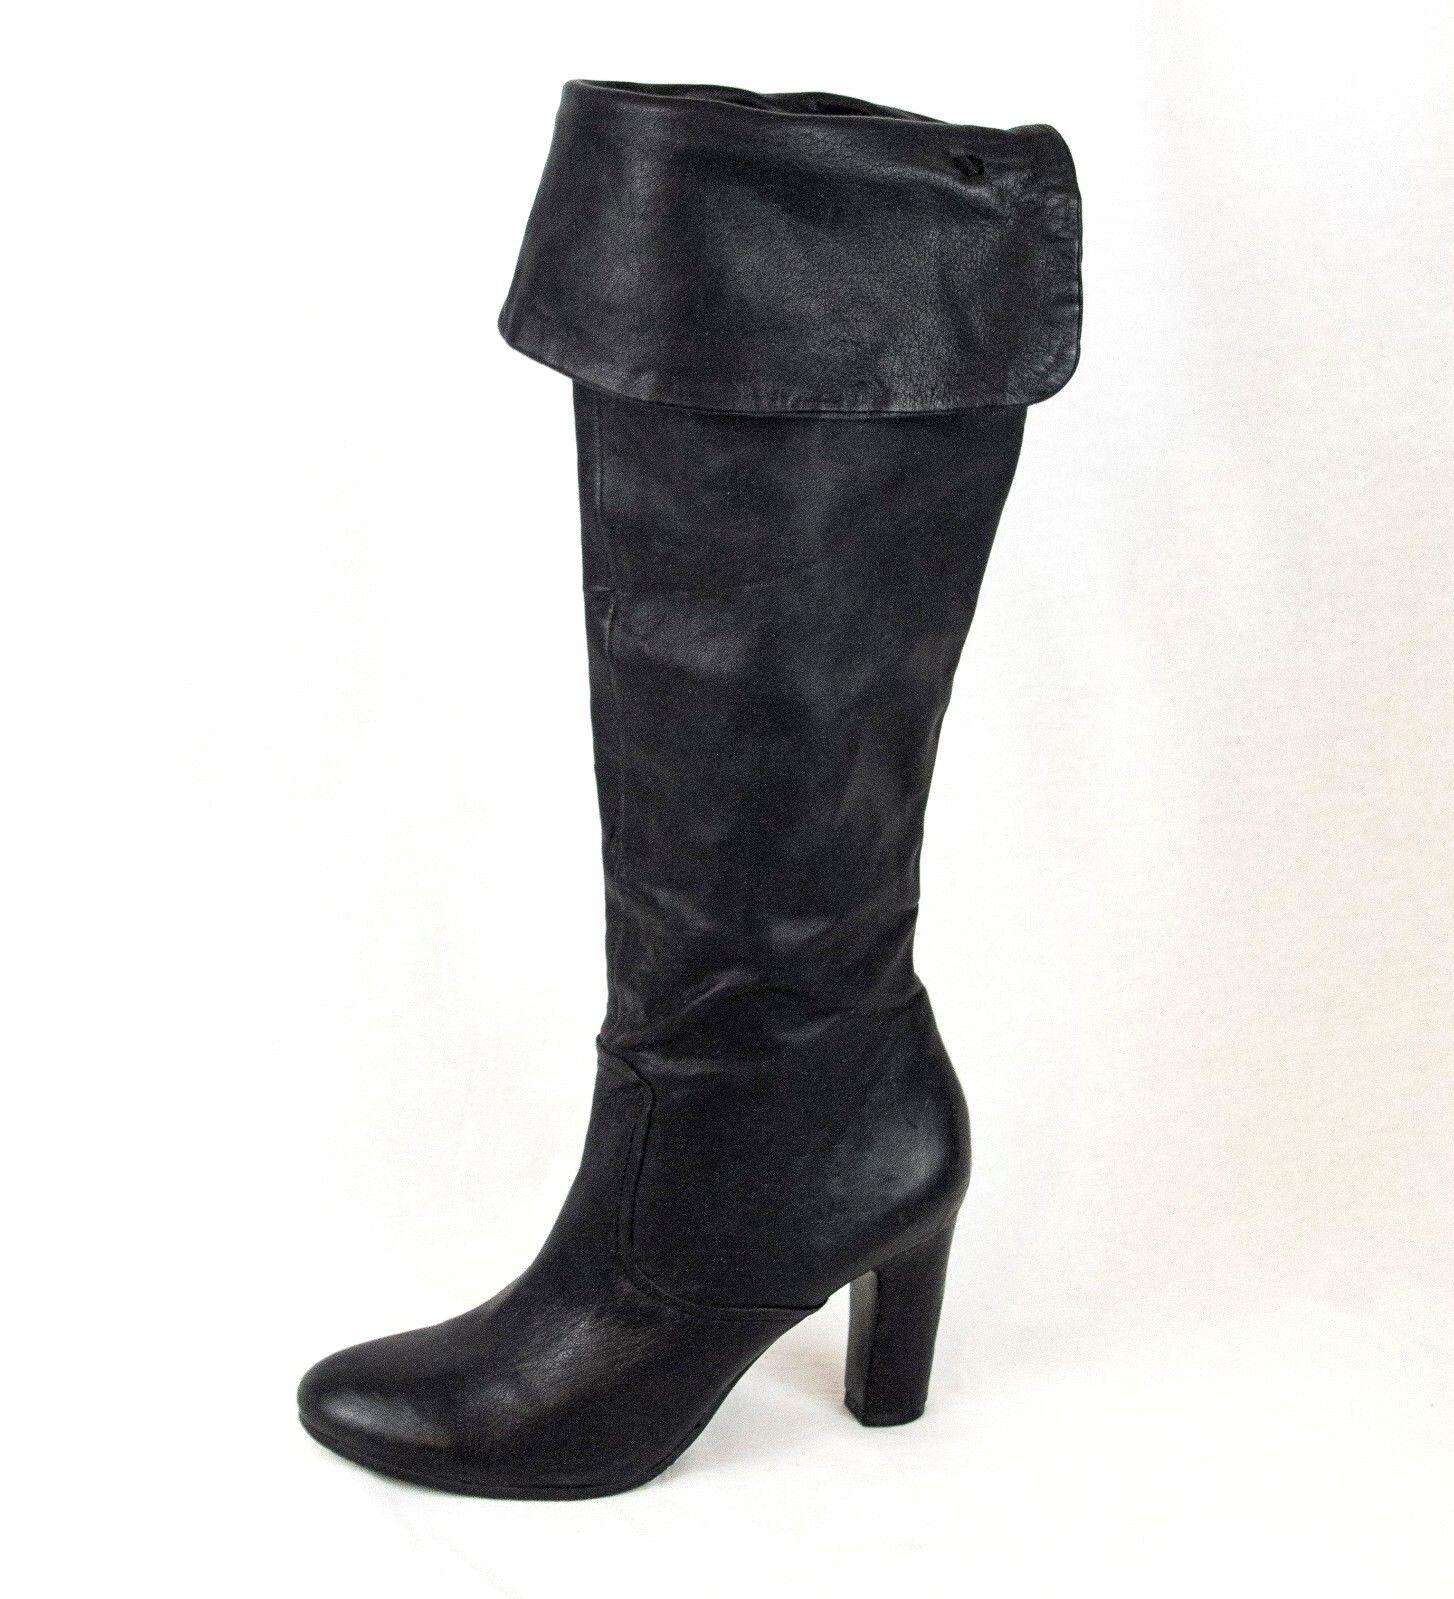 Sam Edelman Stiefel Tall Leder  Sz 9.5 Sarah Sarah Sarah Fully Lined Knee Height 20 in EU 40 22e1d1